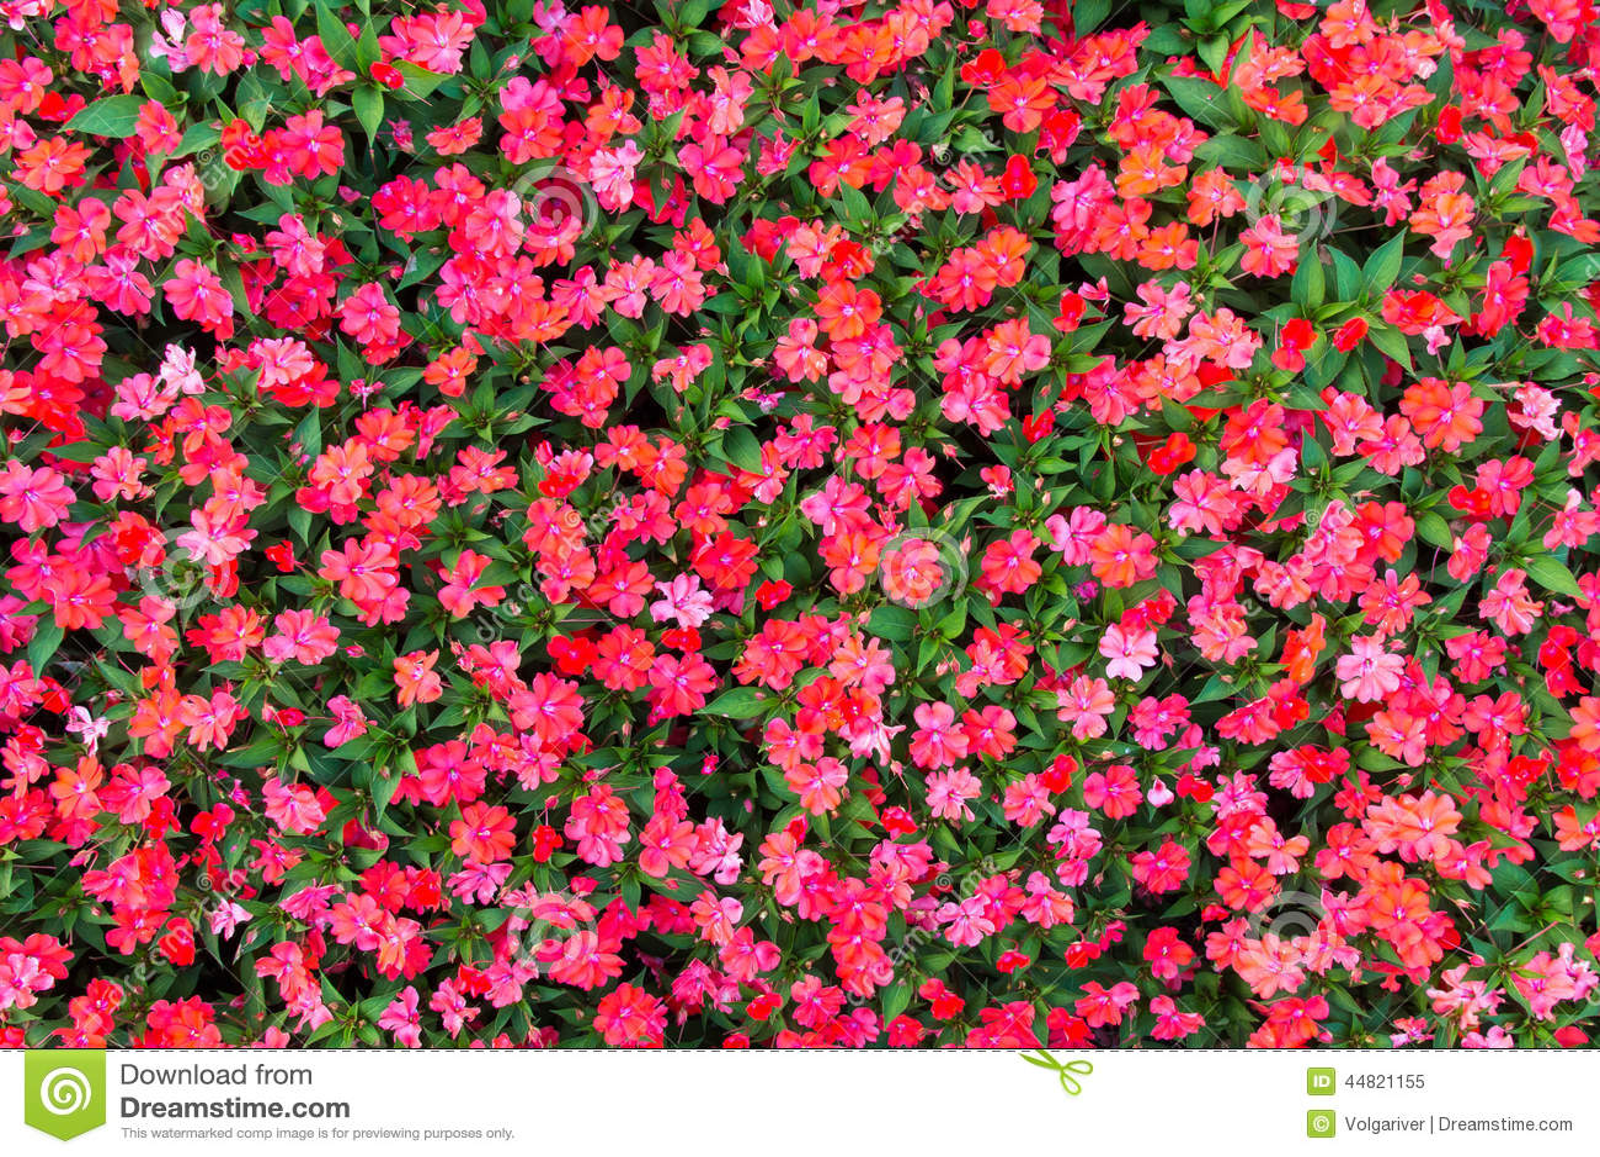 impatiens flowers background stock image